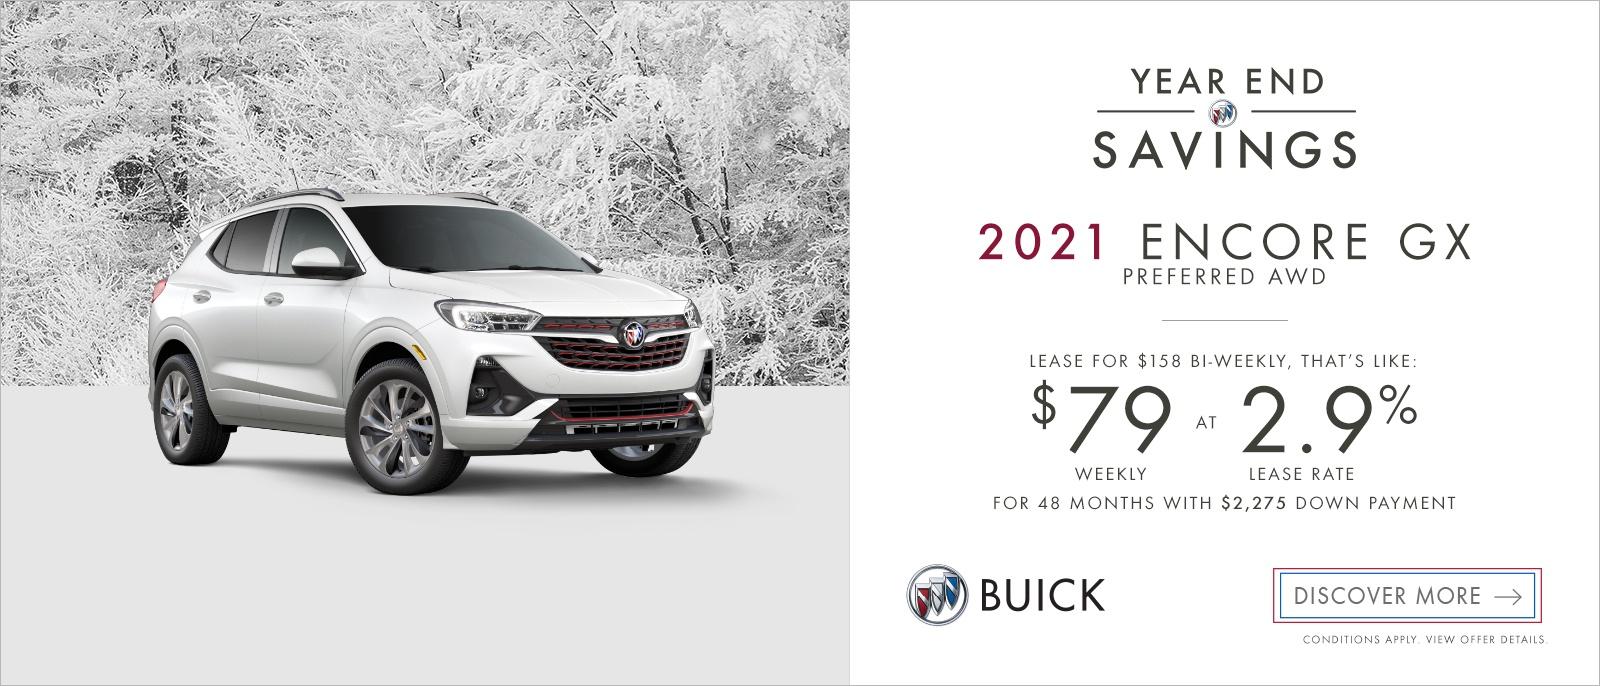 Year End Savings – 2021 Buick Encore GX Preferred AWD